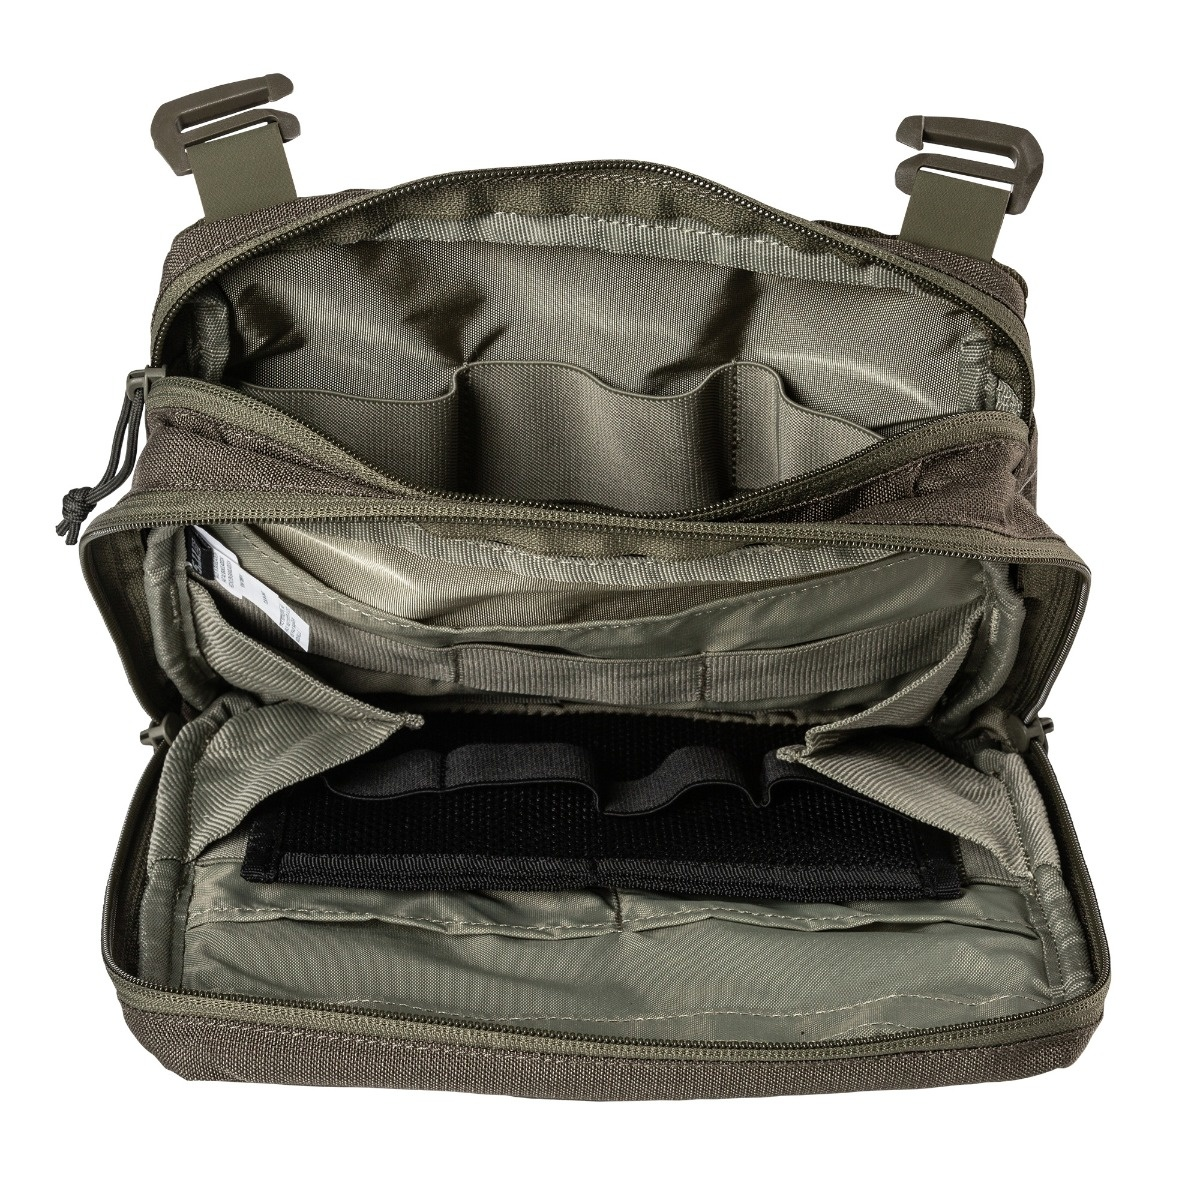 5.11 Tactical 5.11 Tactical Utility 9X9 Gear Set